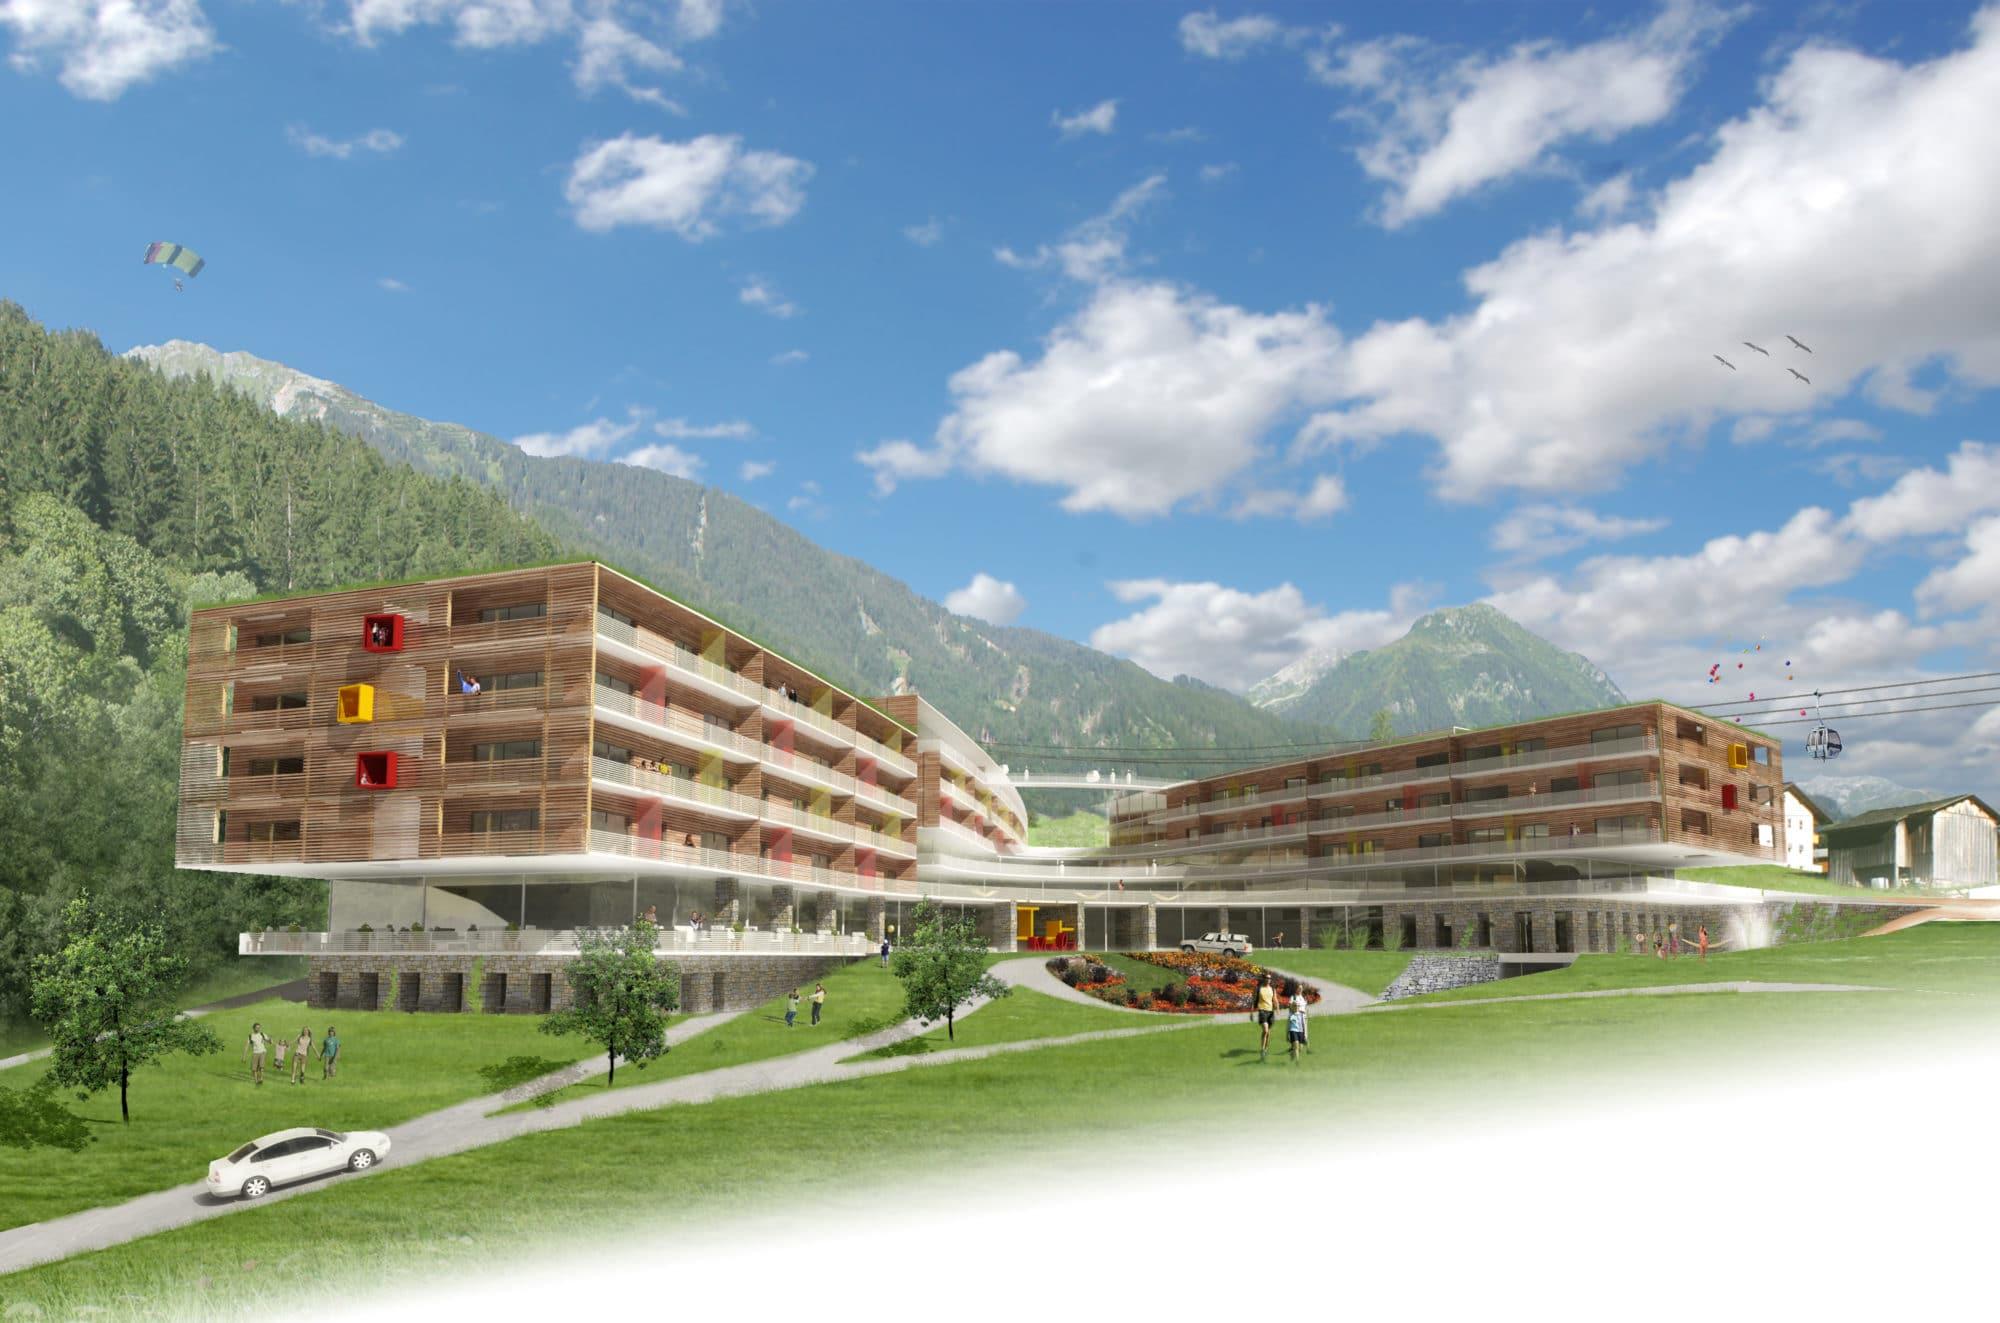 Kinderhotel Vermalino